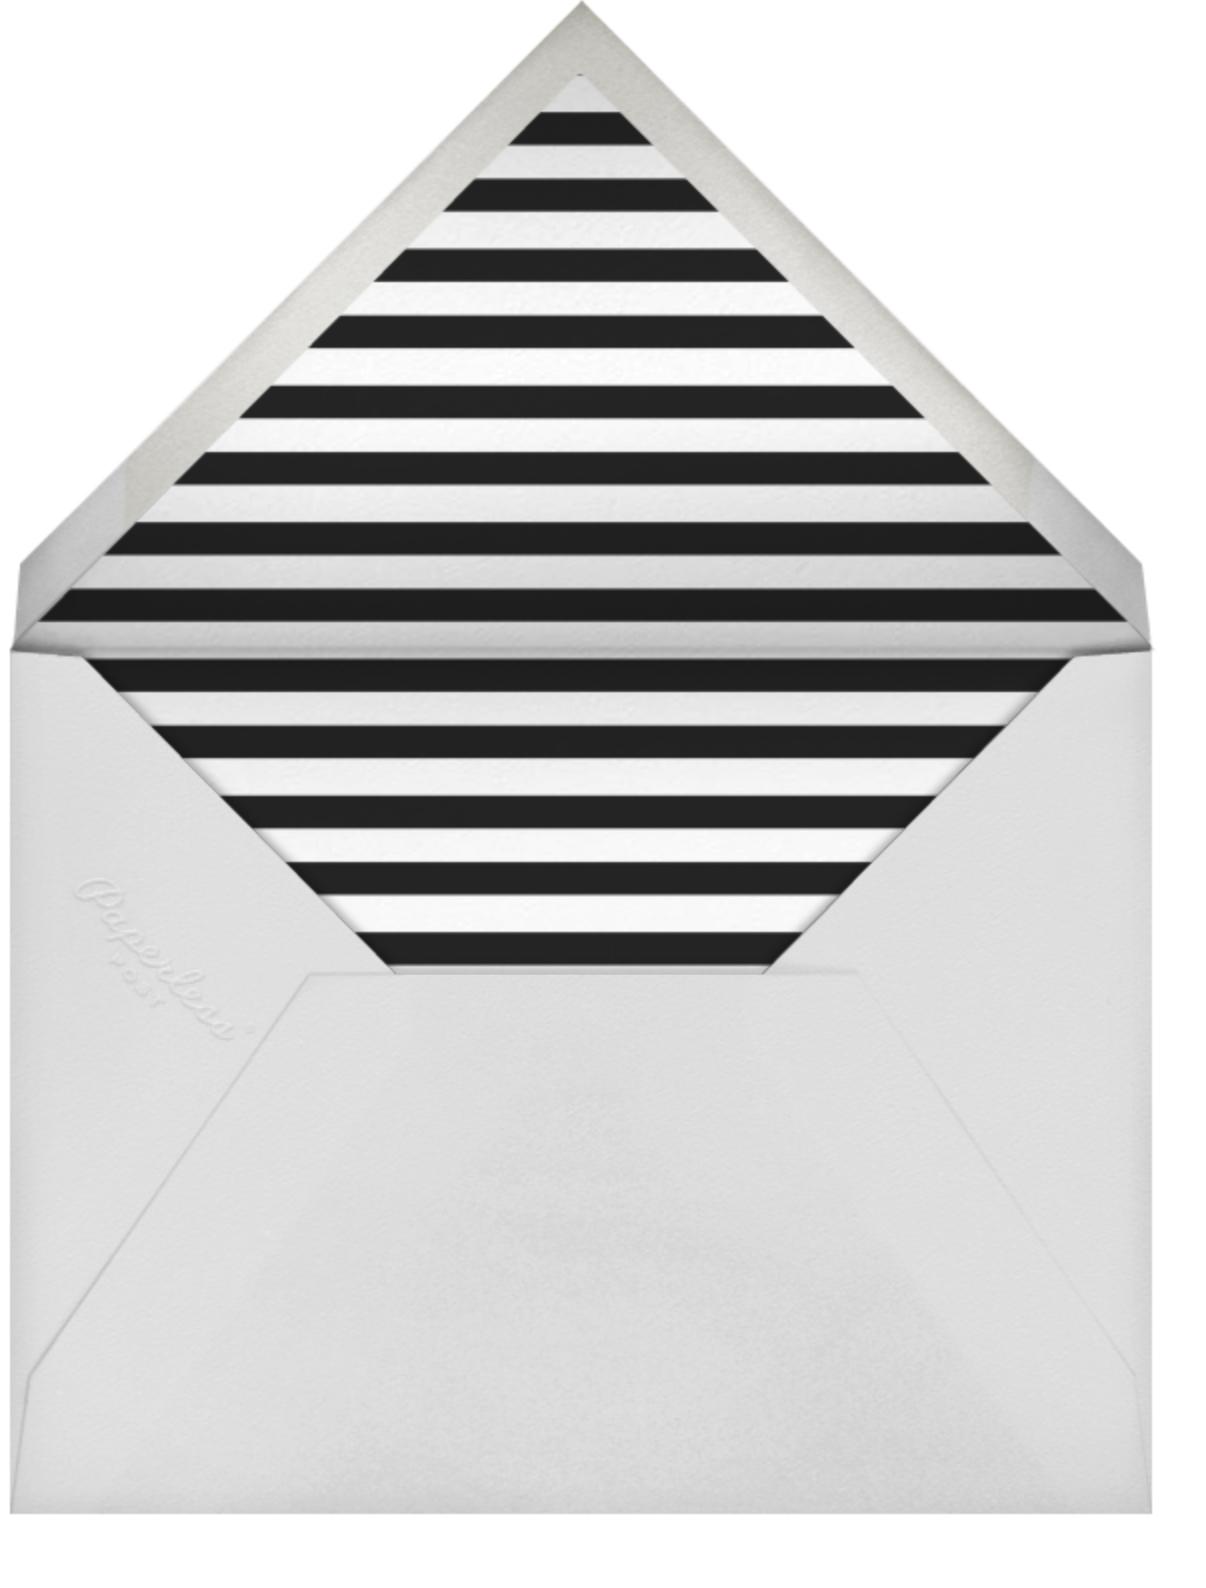 Confetti Horizontal (Double-Sided Photo) - Gold - kate spade new york - Personalized stationery - envelope back